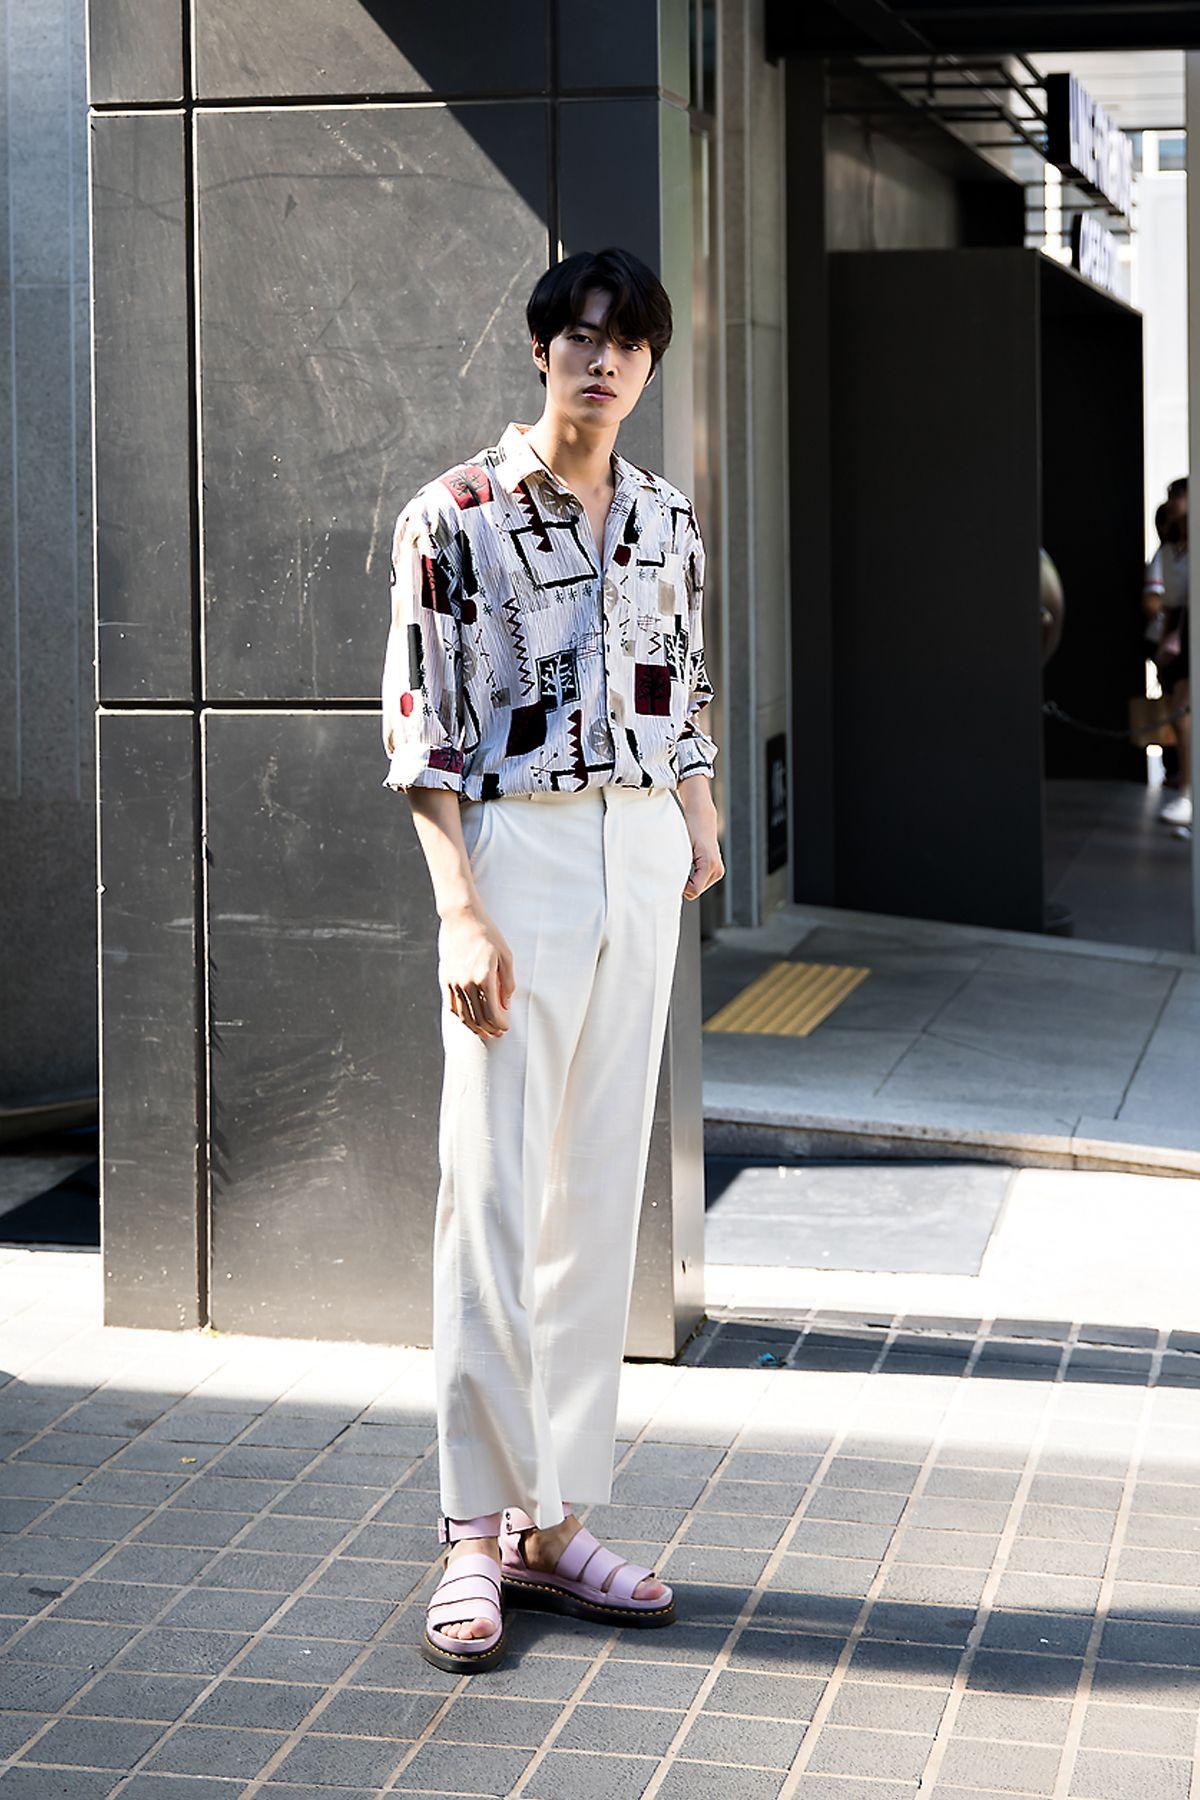 Ko Woongho, Street Fashion 5 in Seoul  Gaya pria, Pakaian, Kemeja